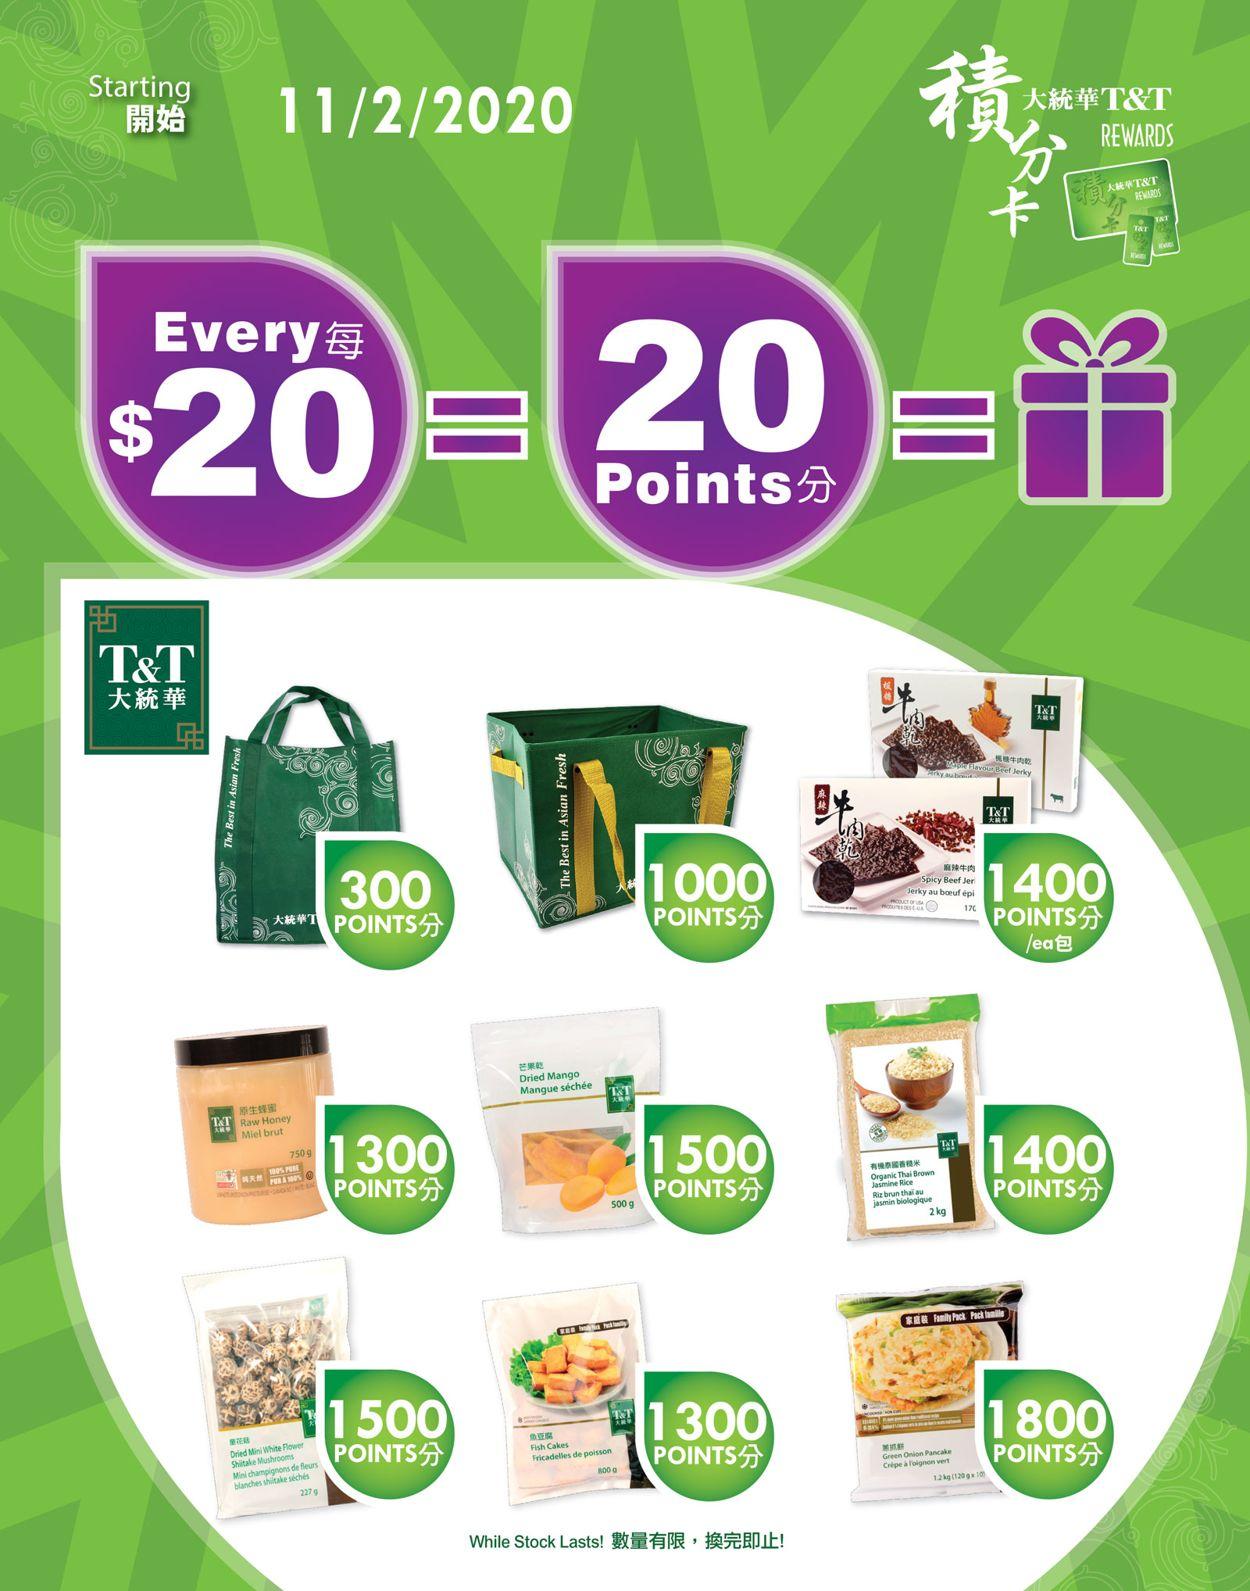 T&T Supermarket - British Columbia Flyer - 11/13-11/19/2020 (Page 11)